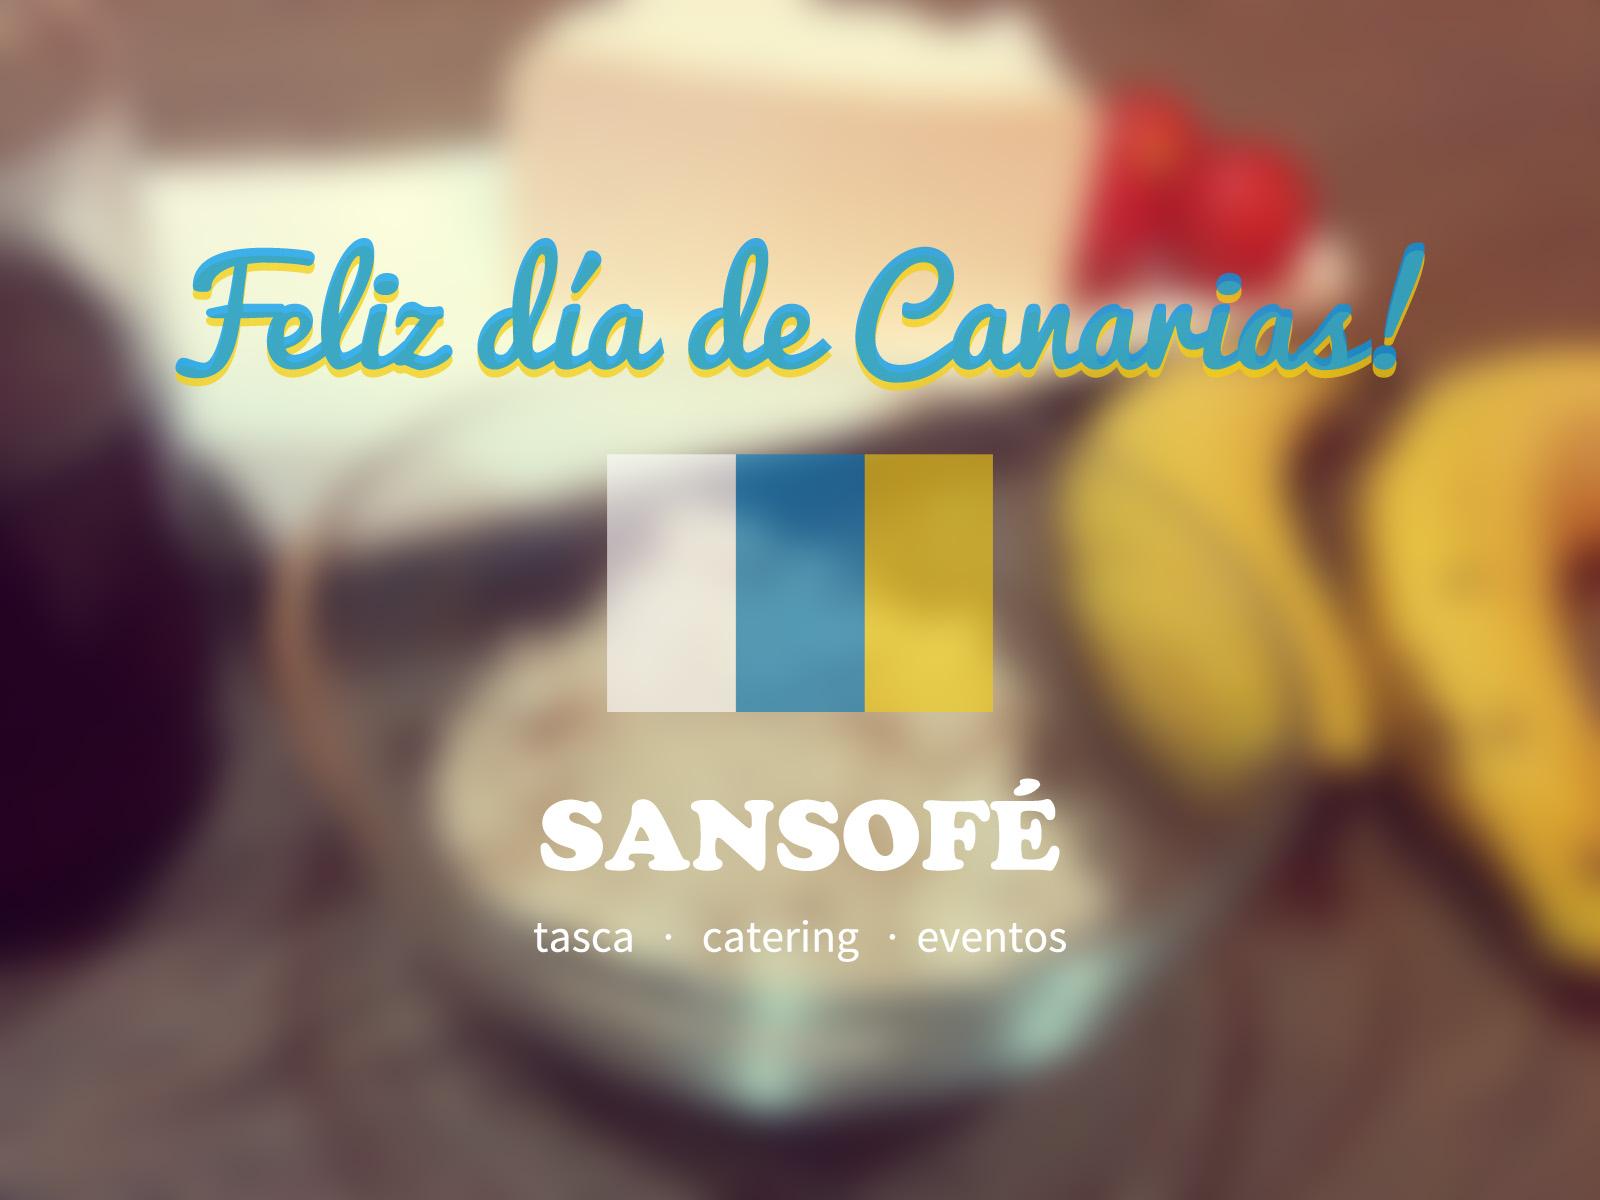 Sansofé Día de Canarias 2014